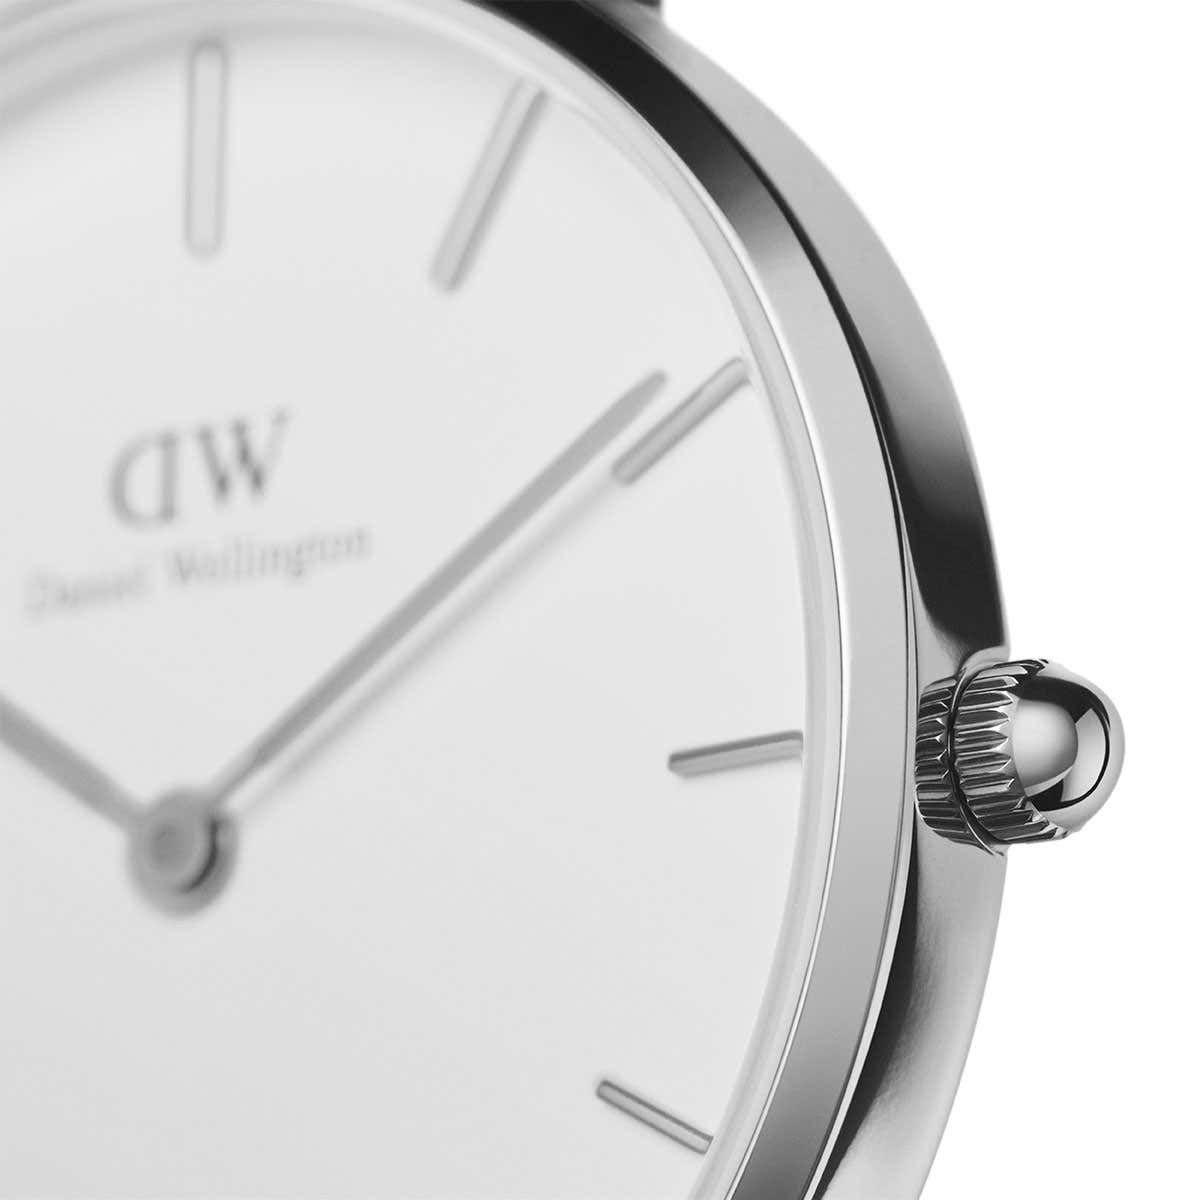 dw官网 dw手表官网 dw中国官网 dw官方旗舰店 DW DW官网  Bundle W+B Petite 32 Rosewater S+Classic Bracelet Silver S